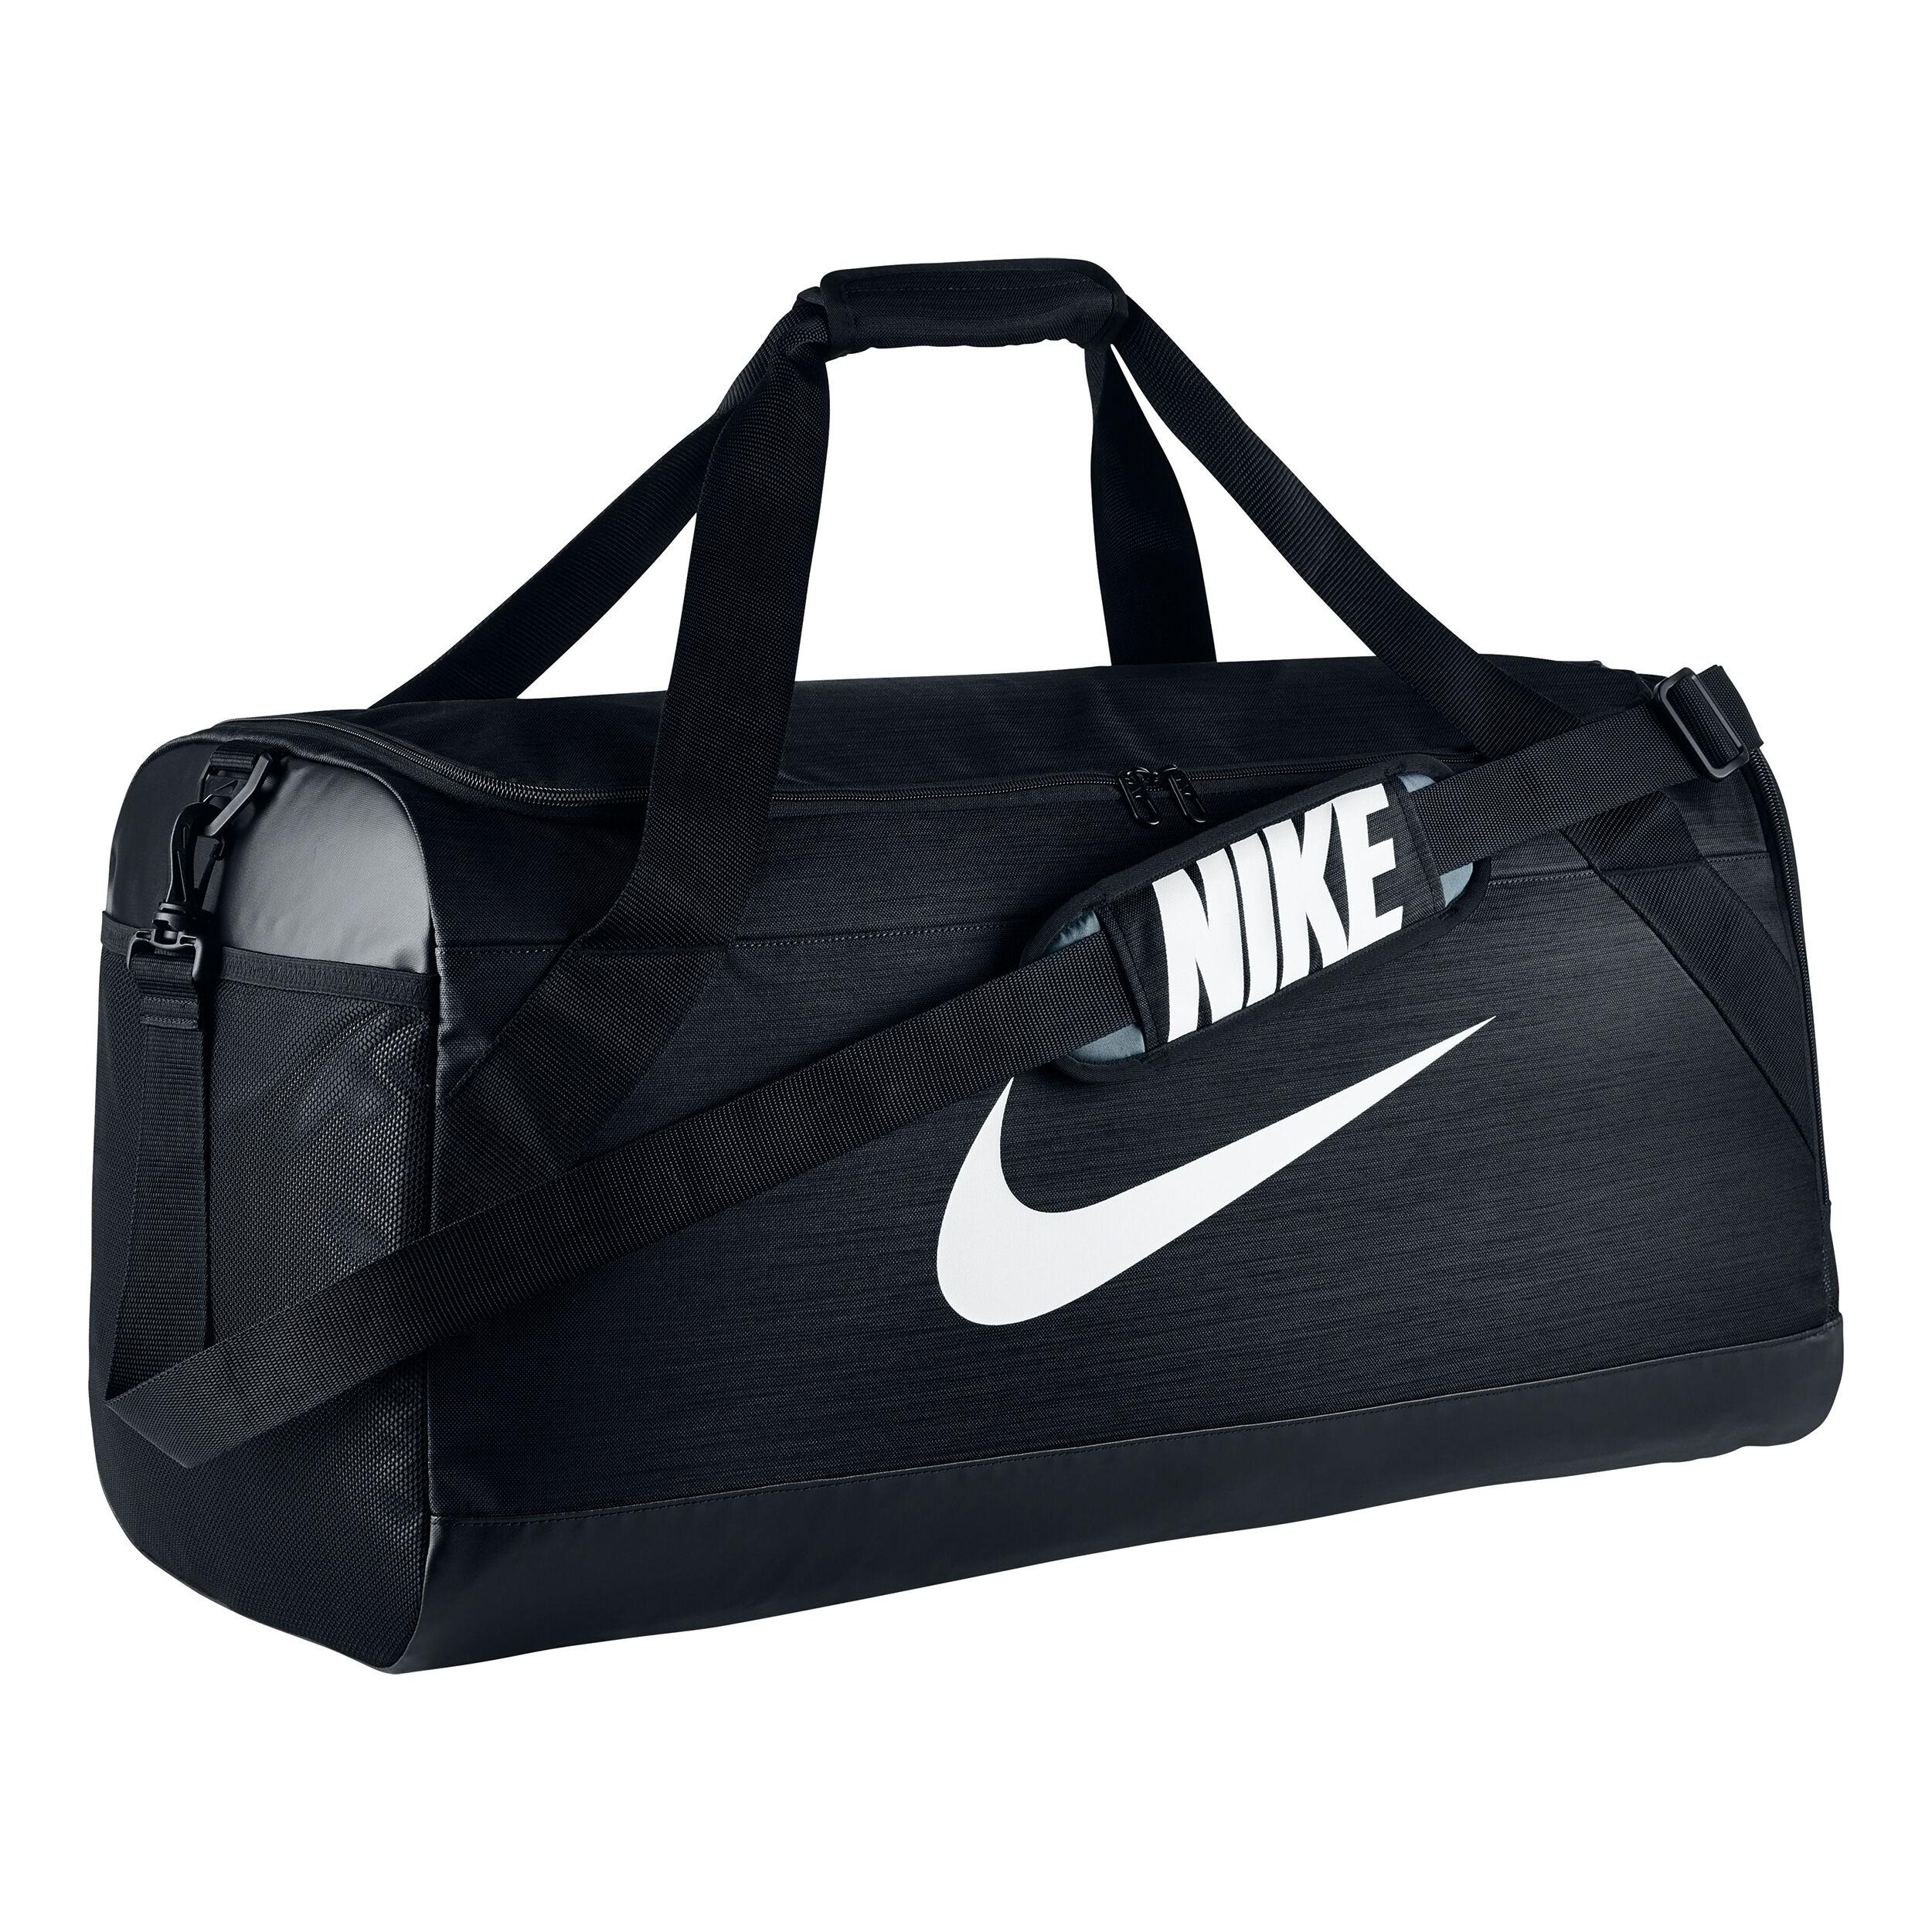 Deporte Grande Brasilia Compra Bolsa Duffel Nike NegroNegro kXuOiPZT